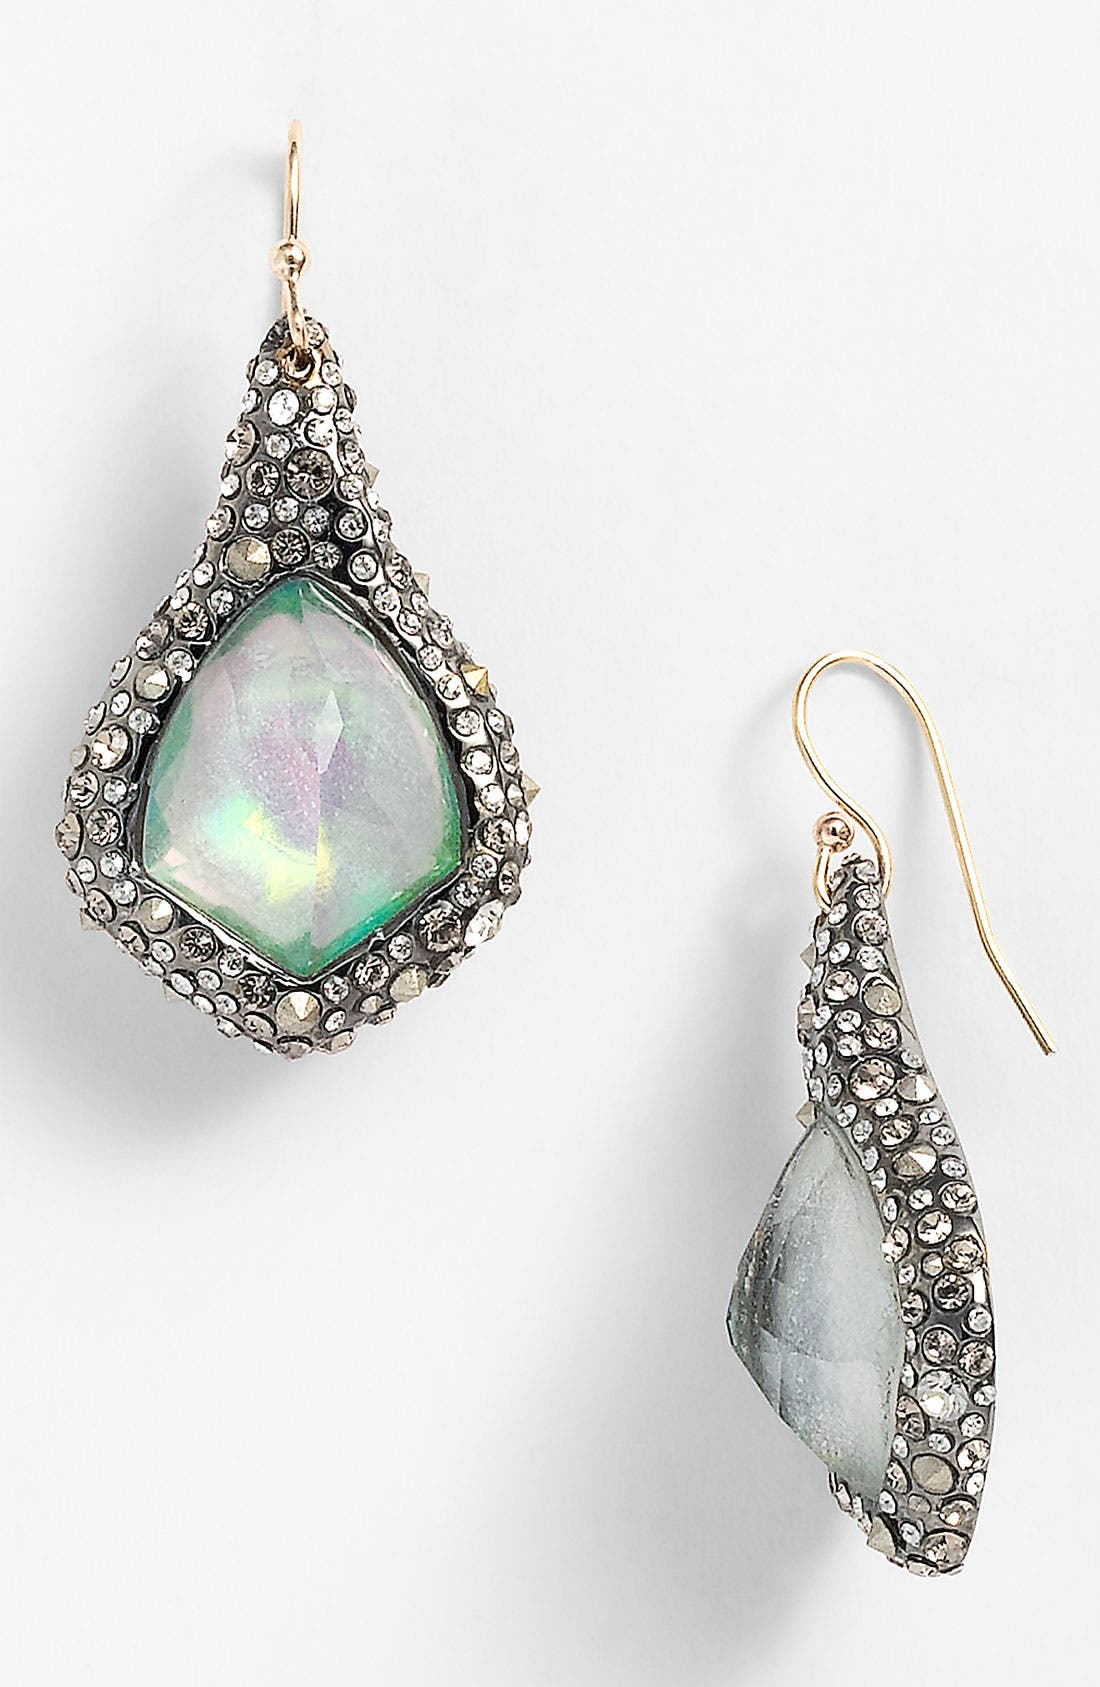 Alternate Image 1 Selected - Alexis Bittar 'Miss Havisham' Crystal Encrusted Kite Earrings